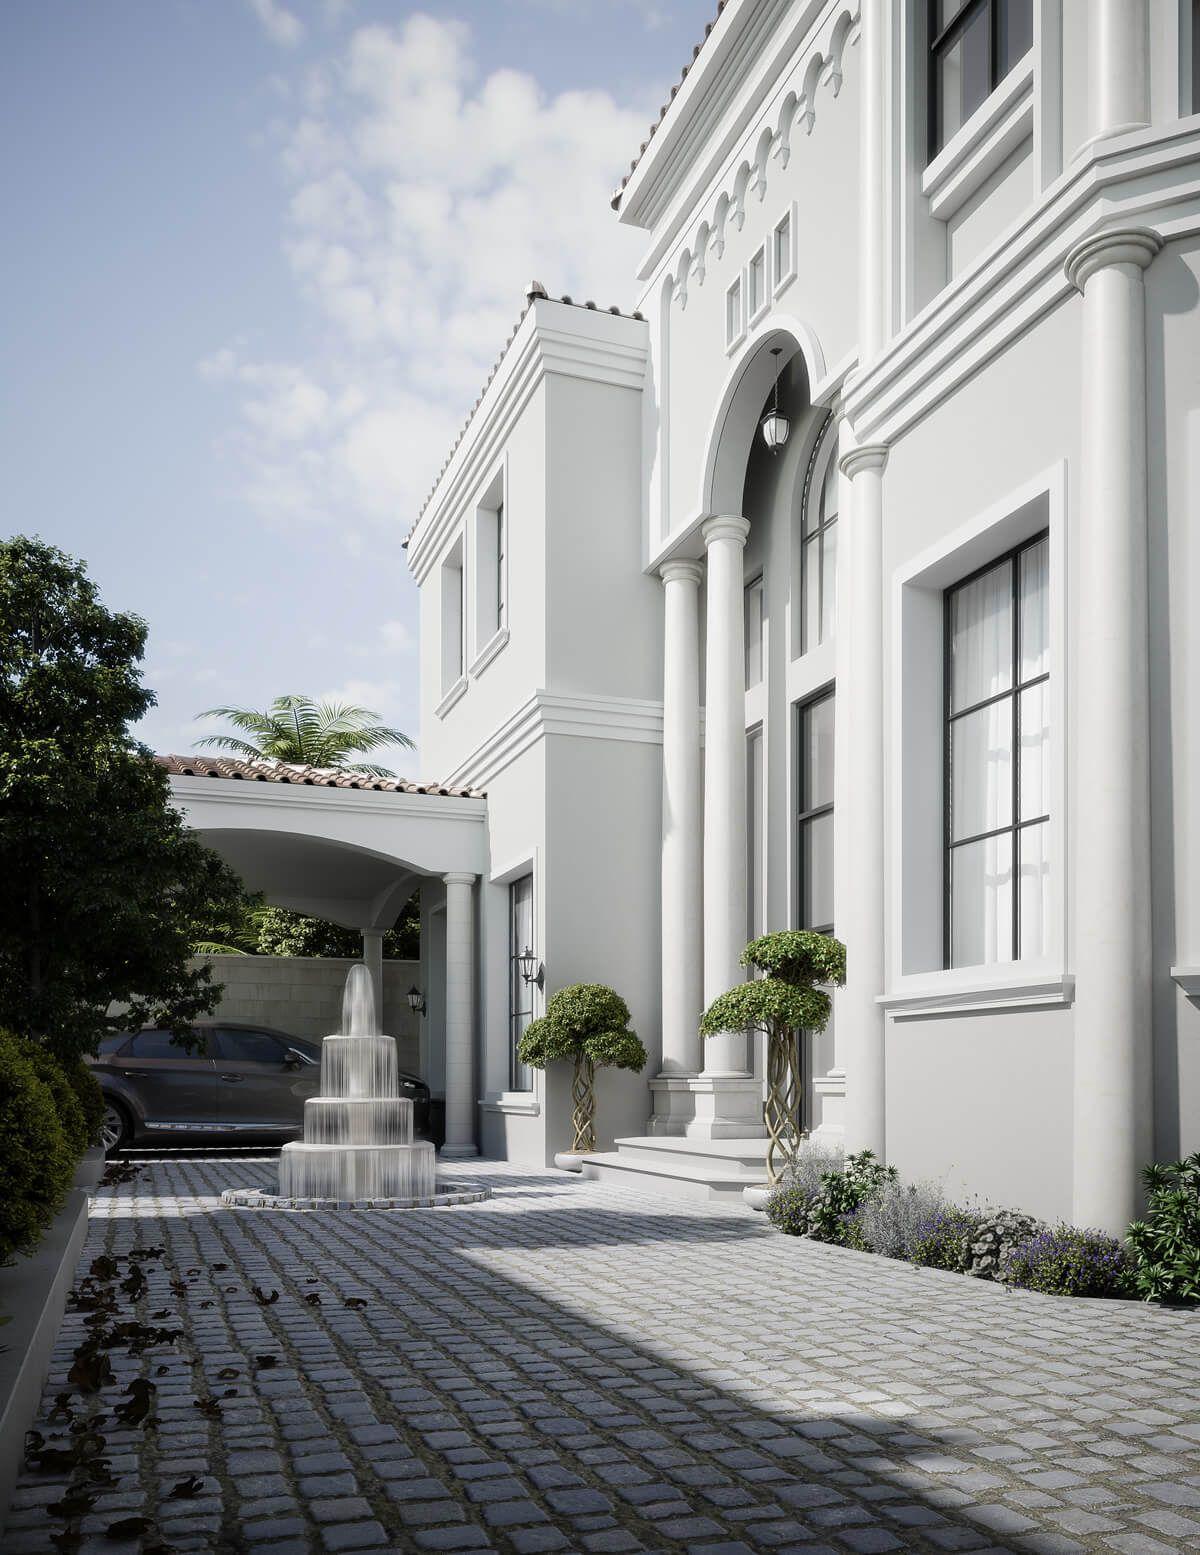 Mediterranean Arabic House Design Home Exterior In Riyadh Saudi Arabia Cas House Outside Design Classic House Exterior Double House